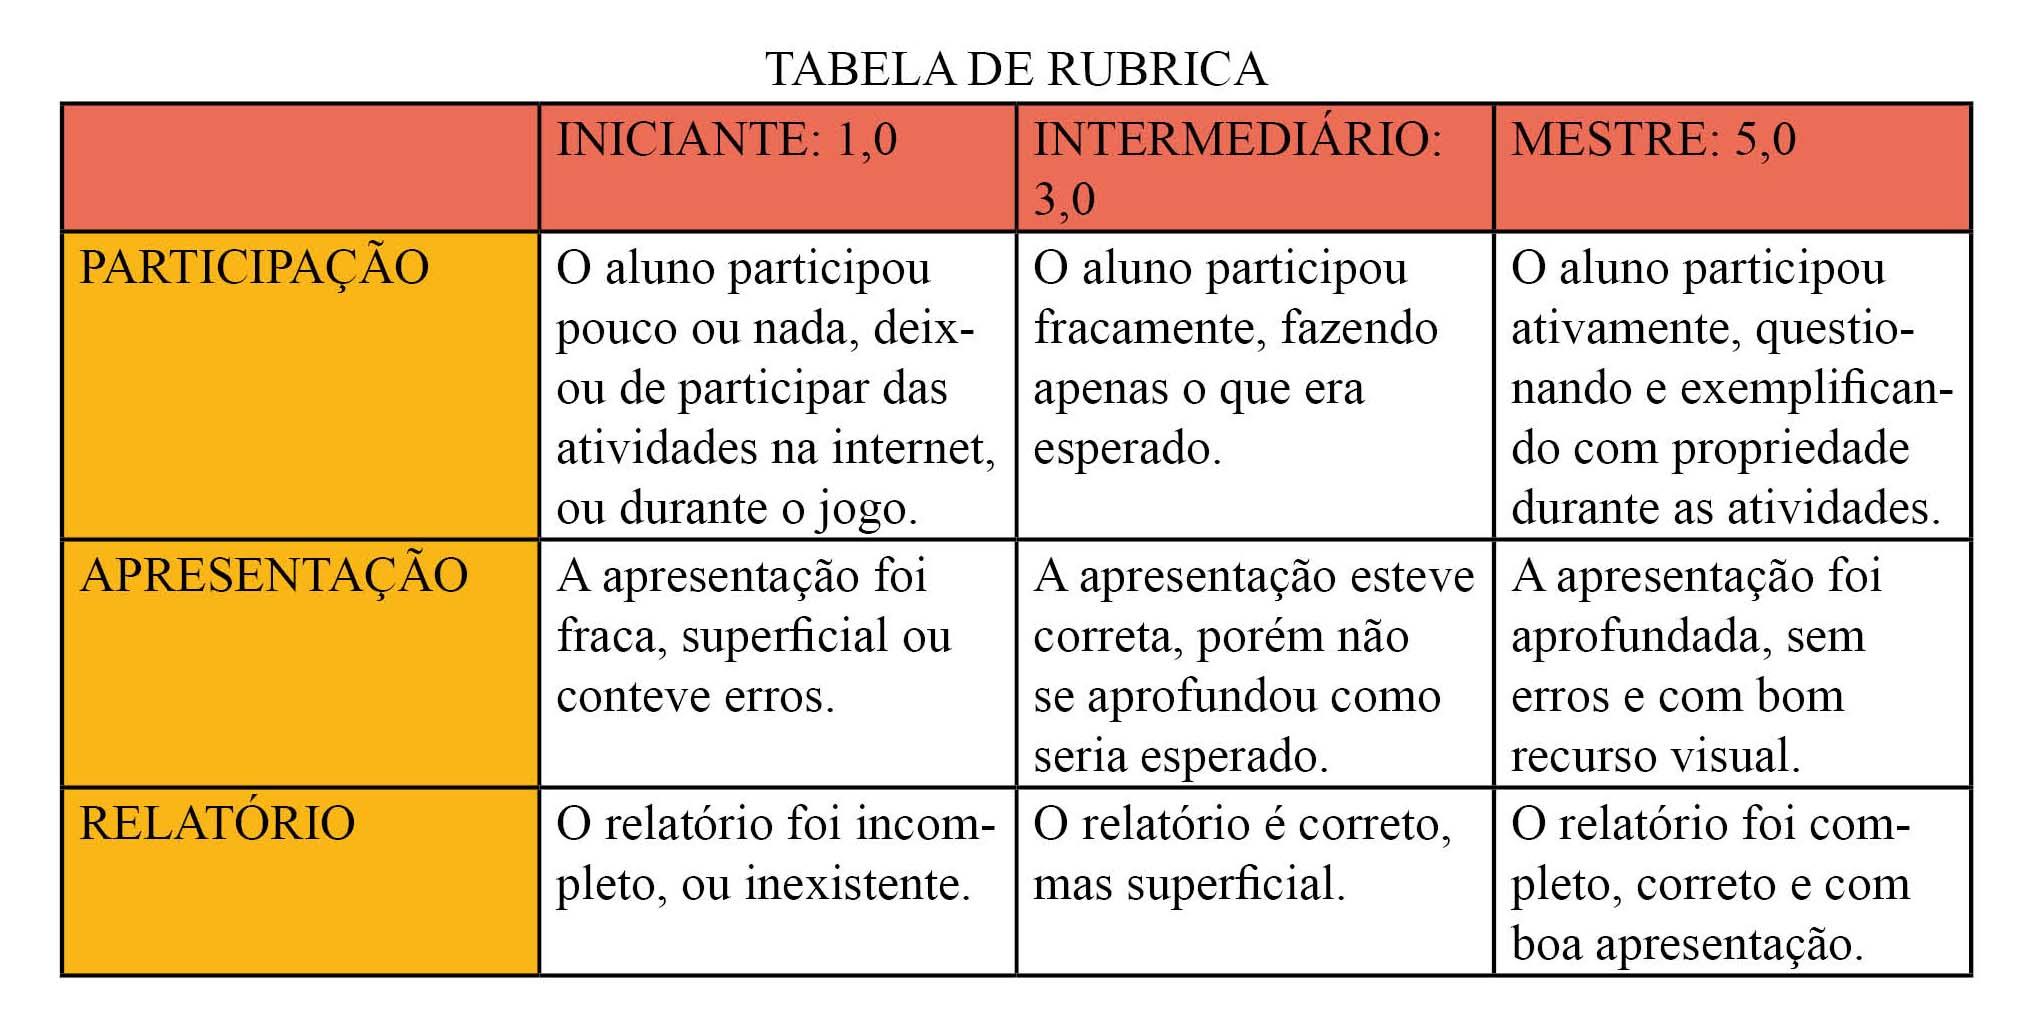 http://portaldoprofessor.mec.gov.br/storage/discovirtual/aulas/904/imagens/rubrica13.jpg